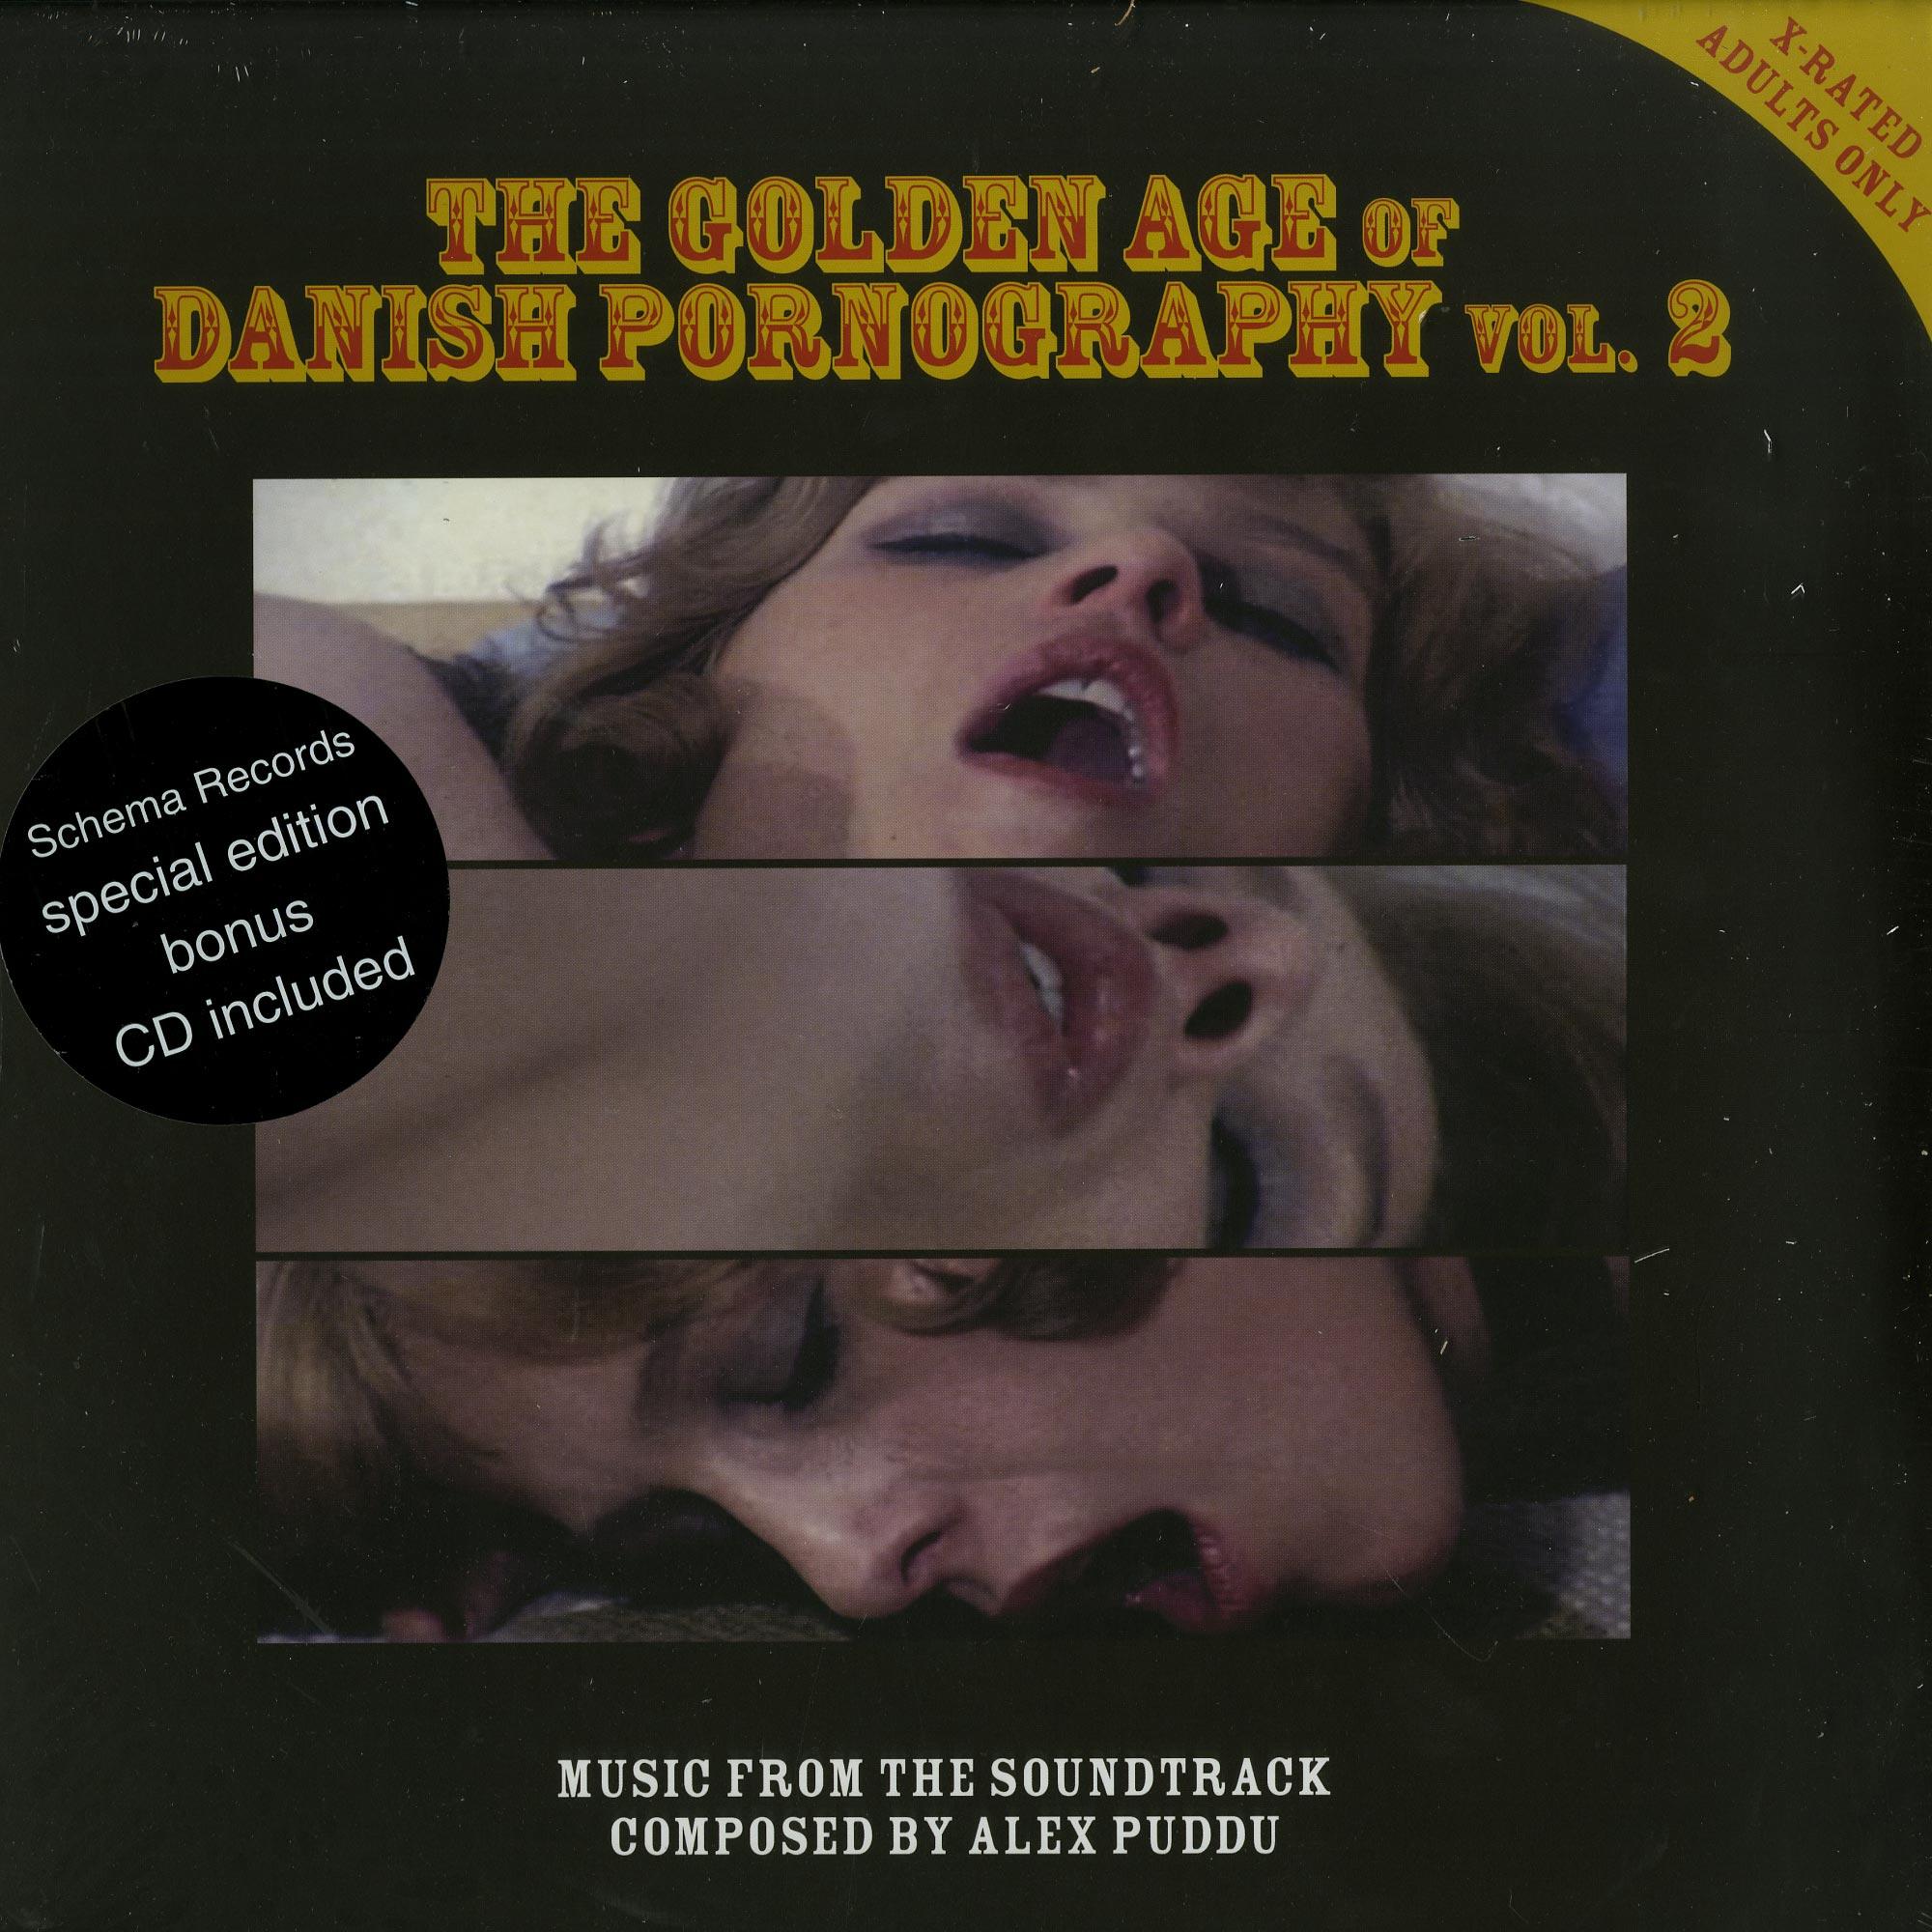 Alex Puddu - THE GOLDEN AGE OF DANISH PORNOGRAPHY VOL 2